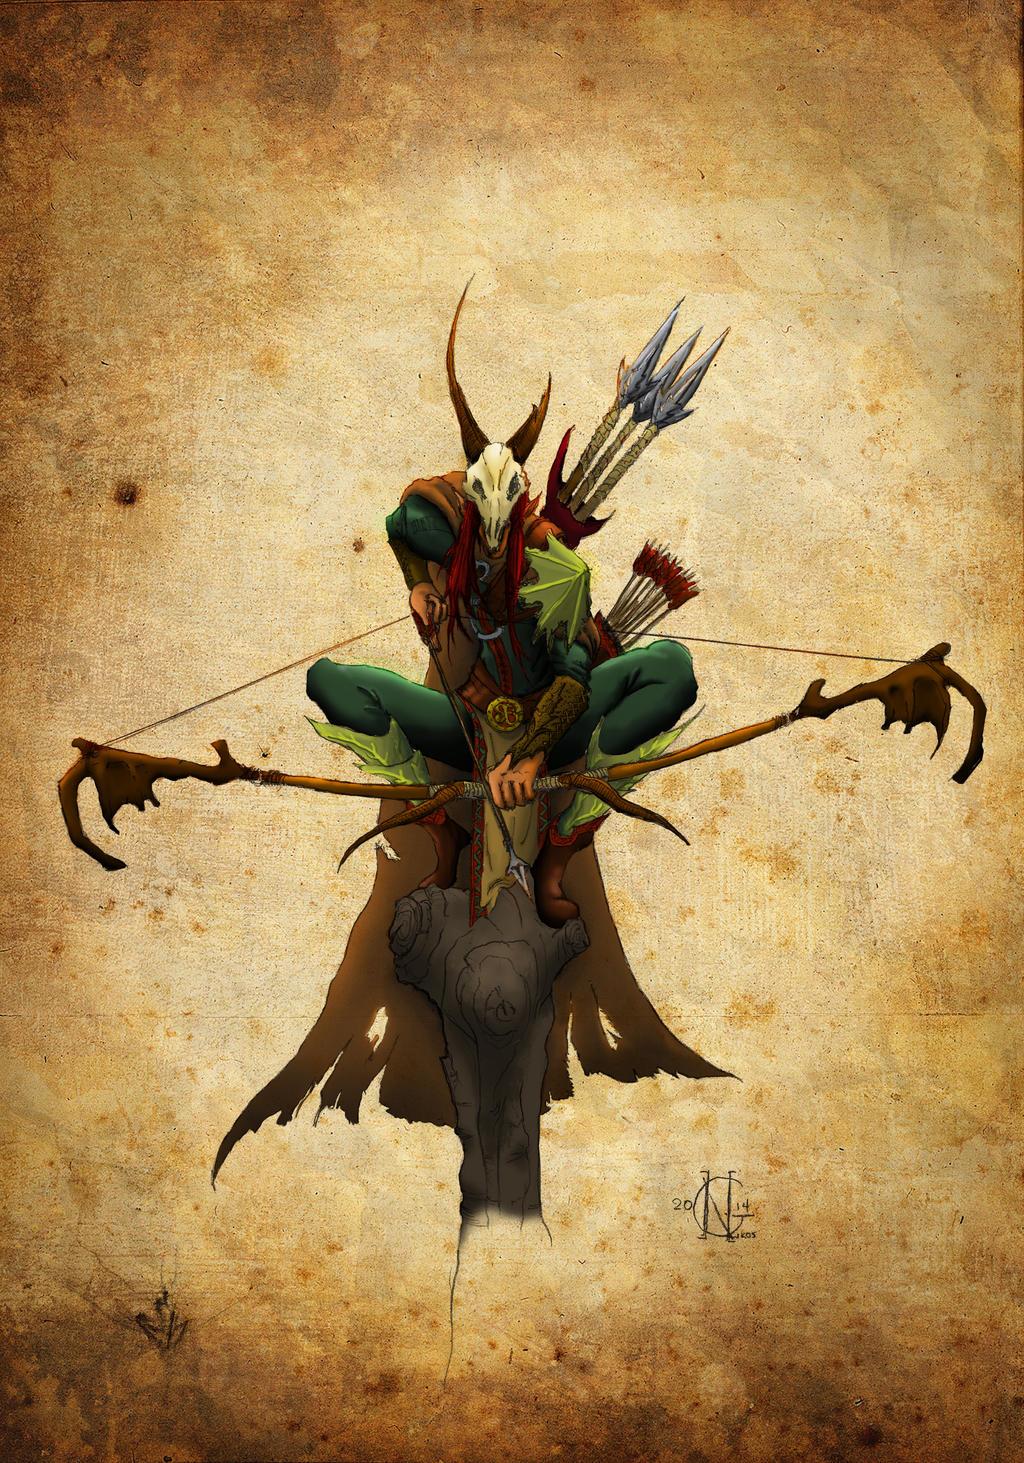 Elf hunter by Erkahoth